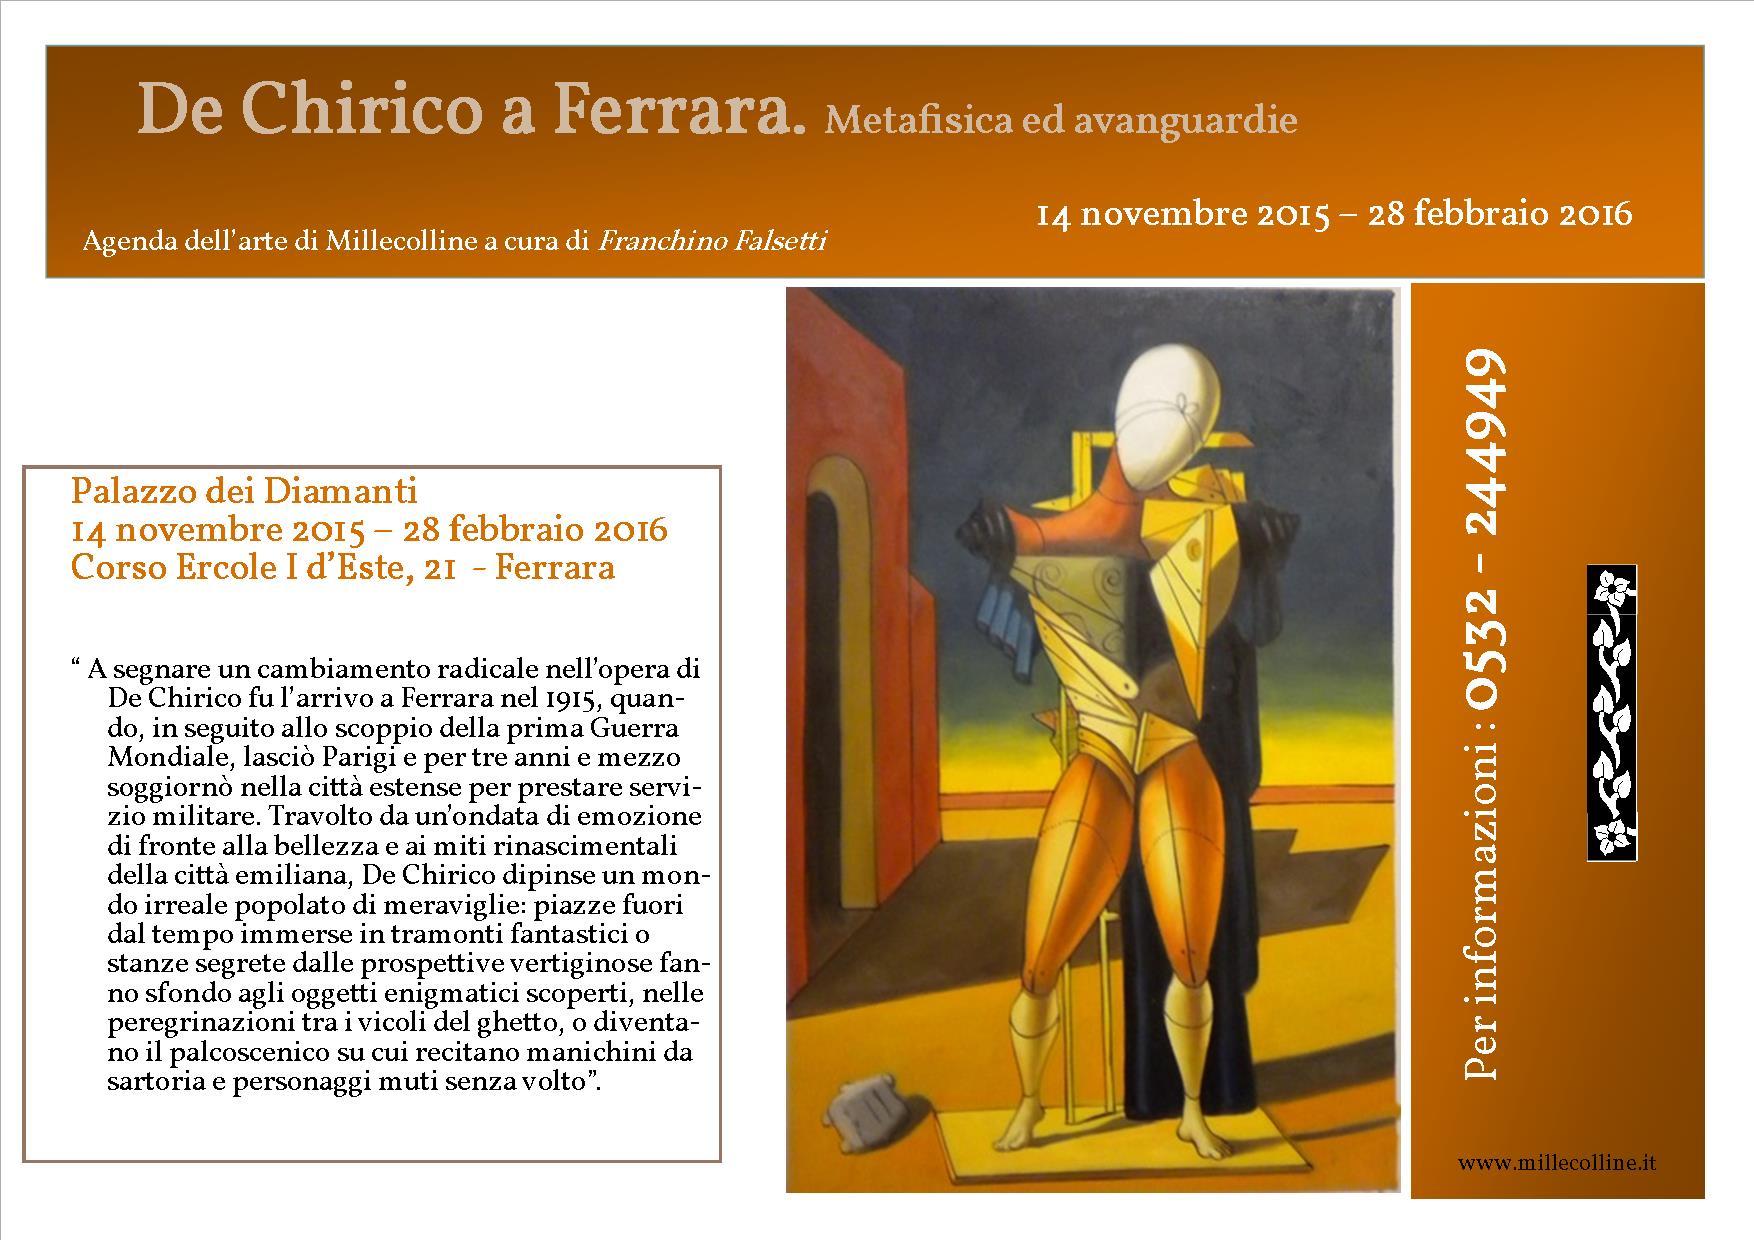 Agenda - De Chirico